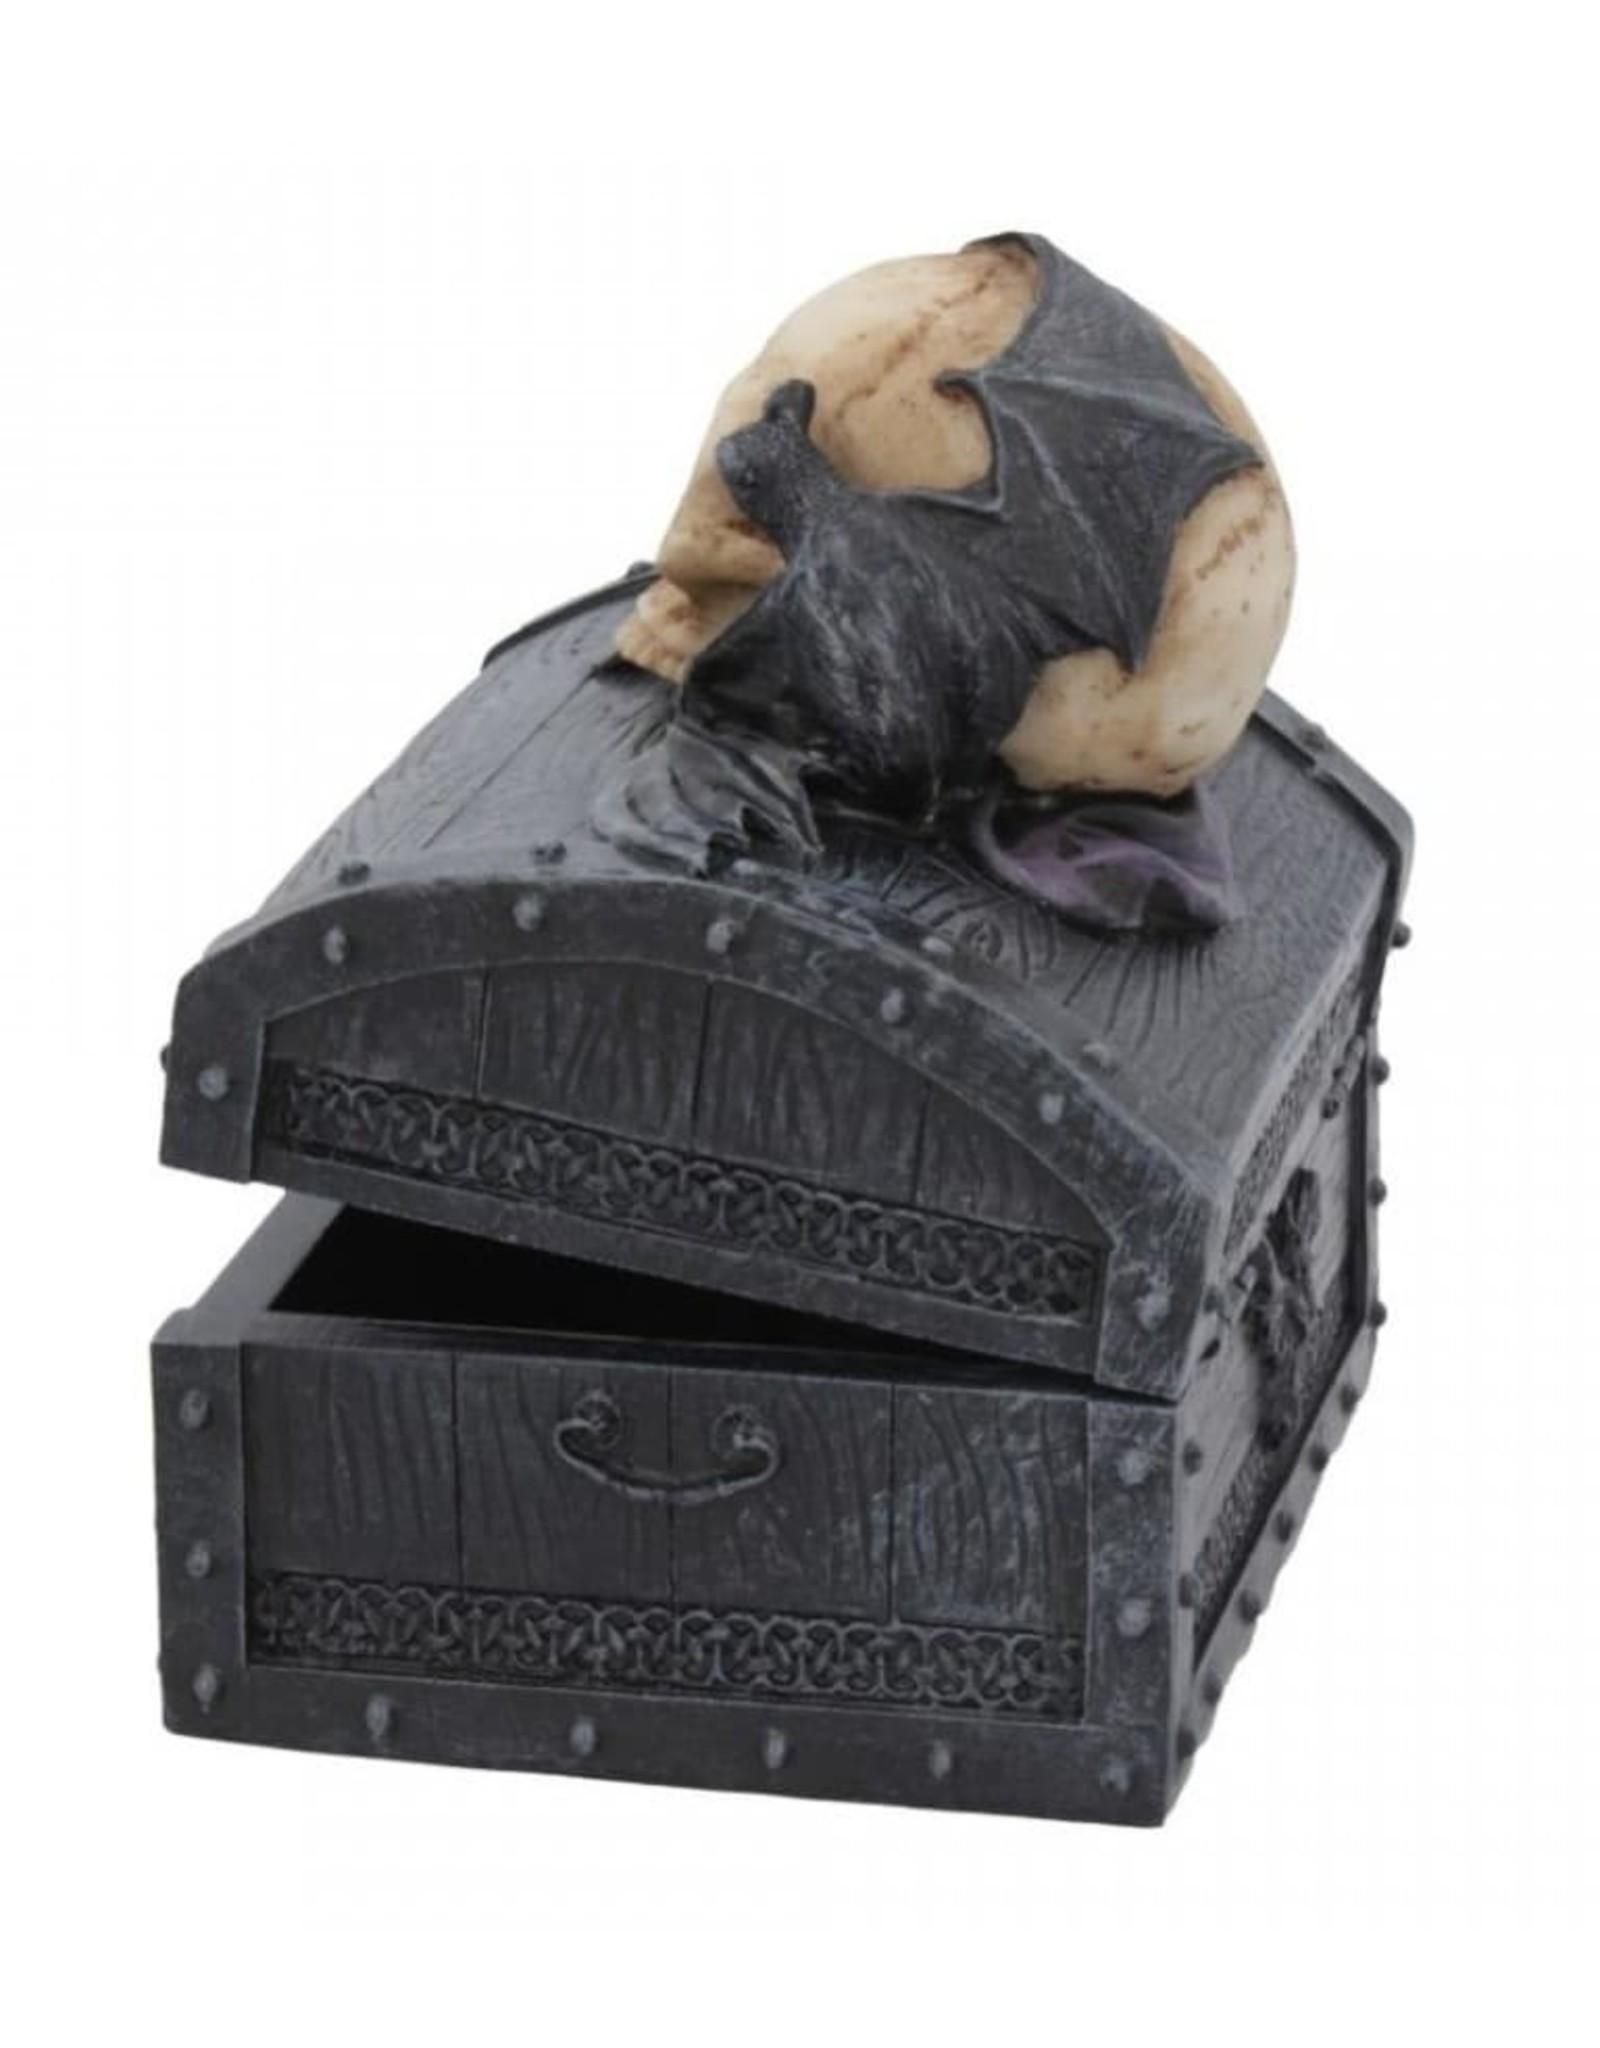 Alator Gothic and Steampunk accessories - Dark Shroud Bat & Skull Treasure Chest - Nemesis Now